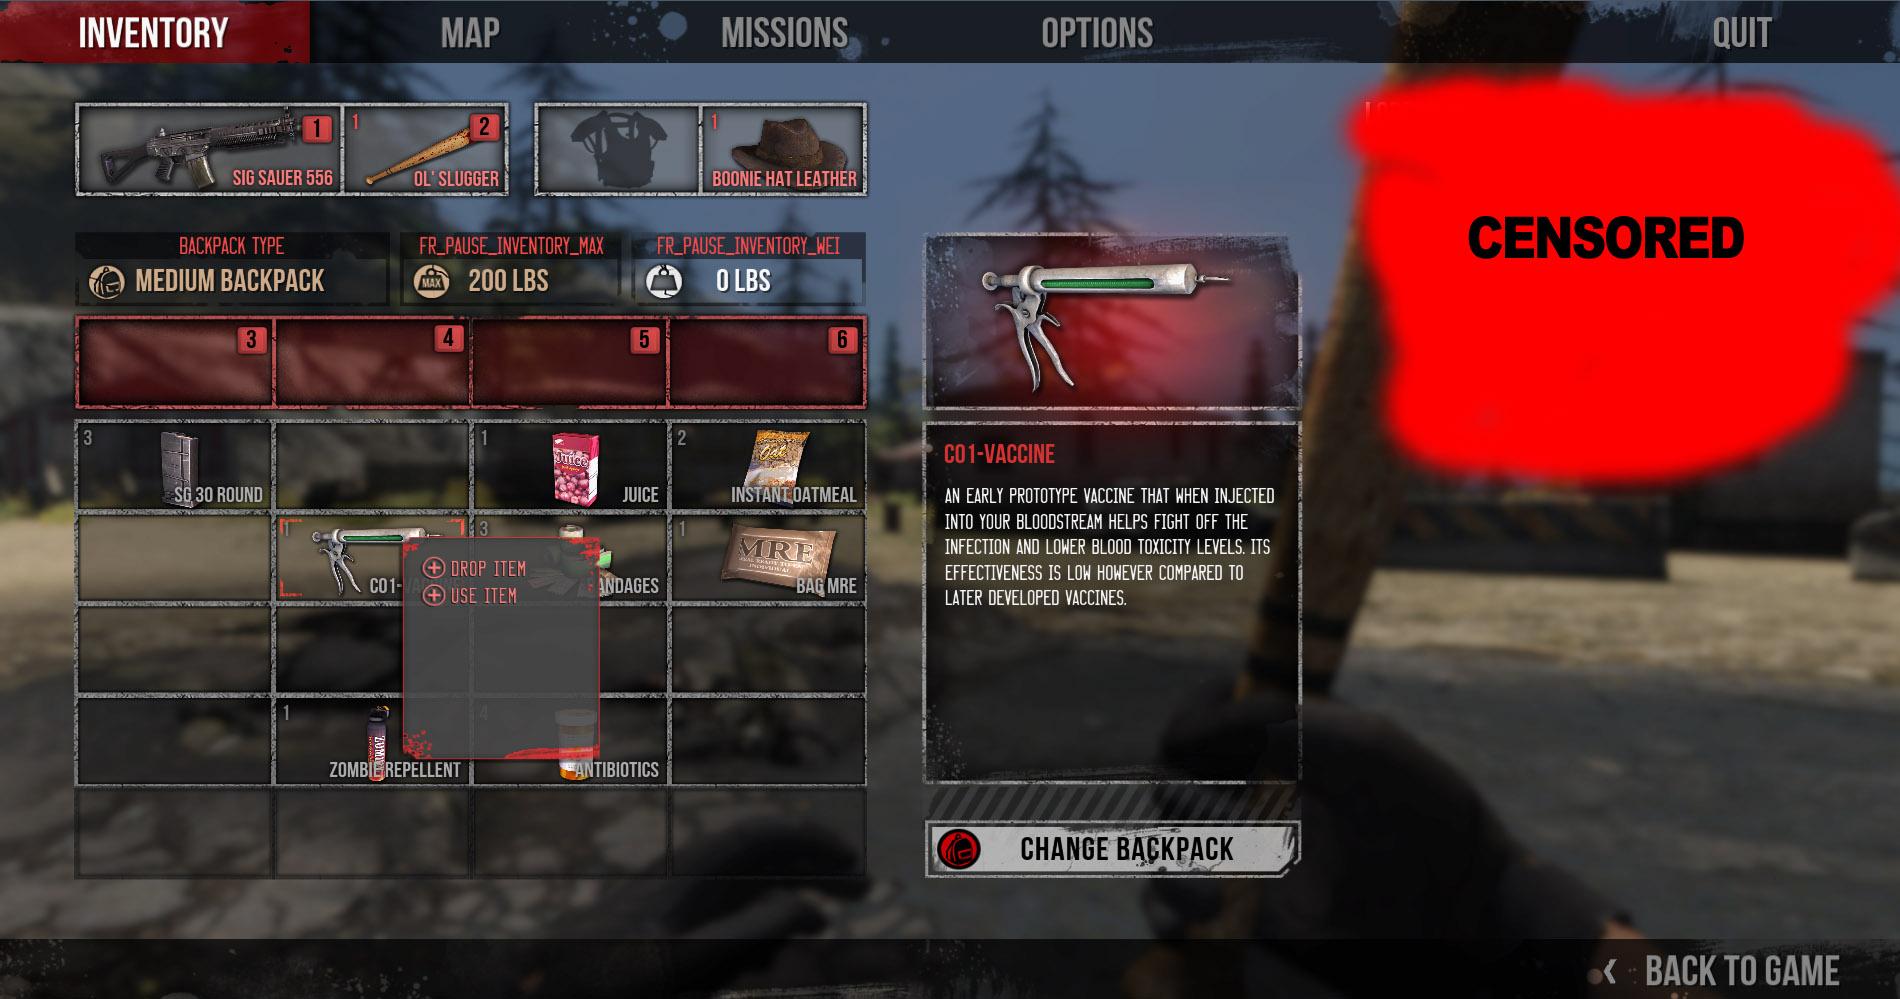 The War Z: Inventar-Screenshot aus dem Survival Horror MMO